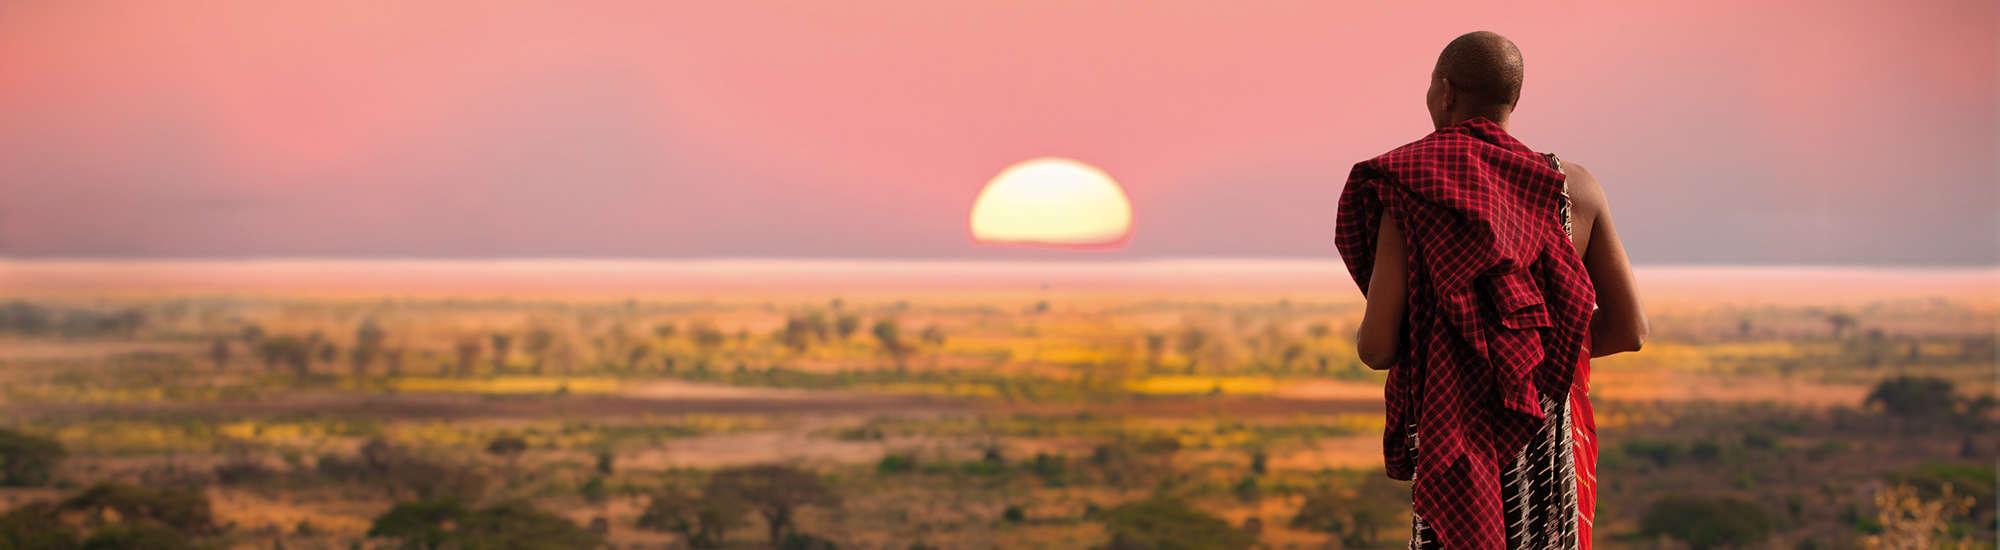 Tanzania Safari Parchi ed Etnie